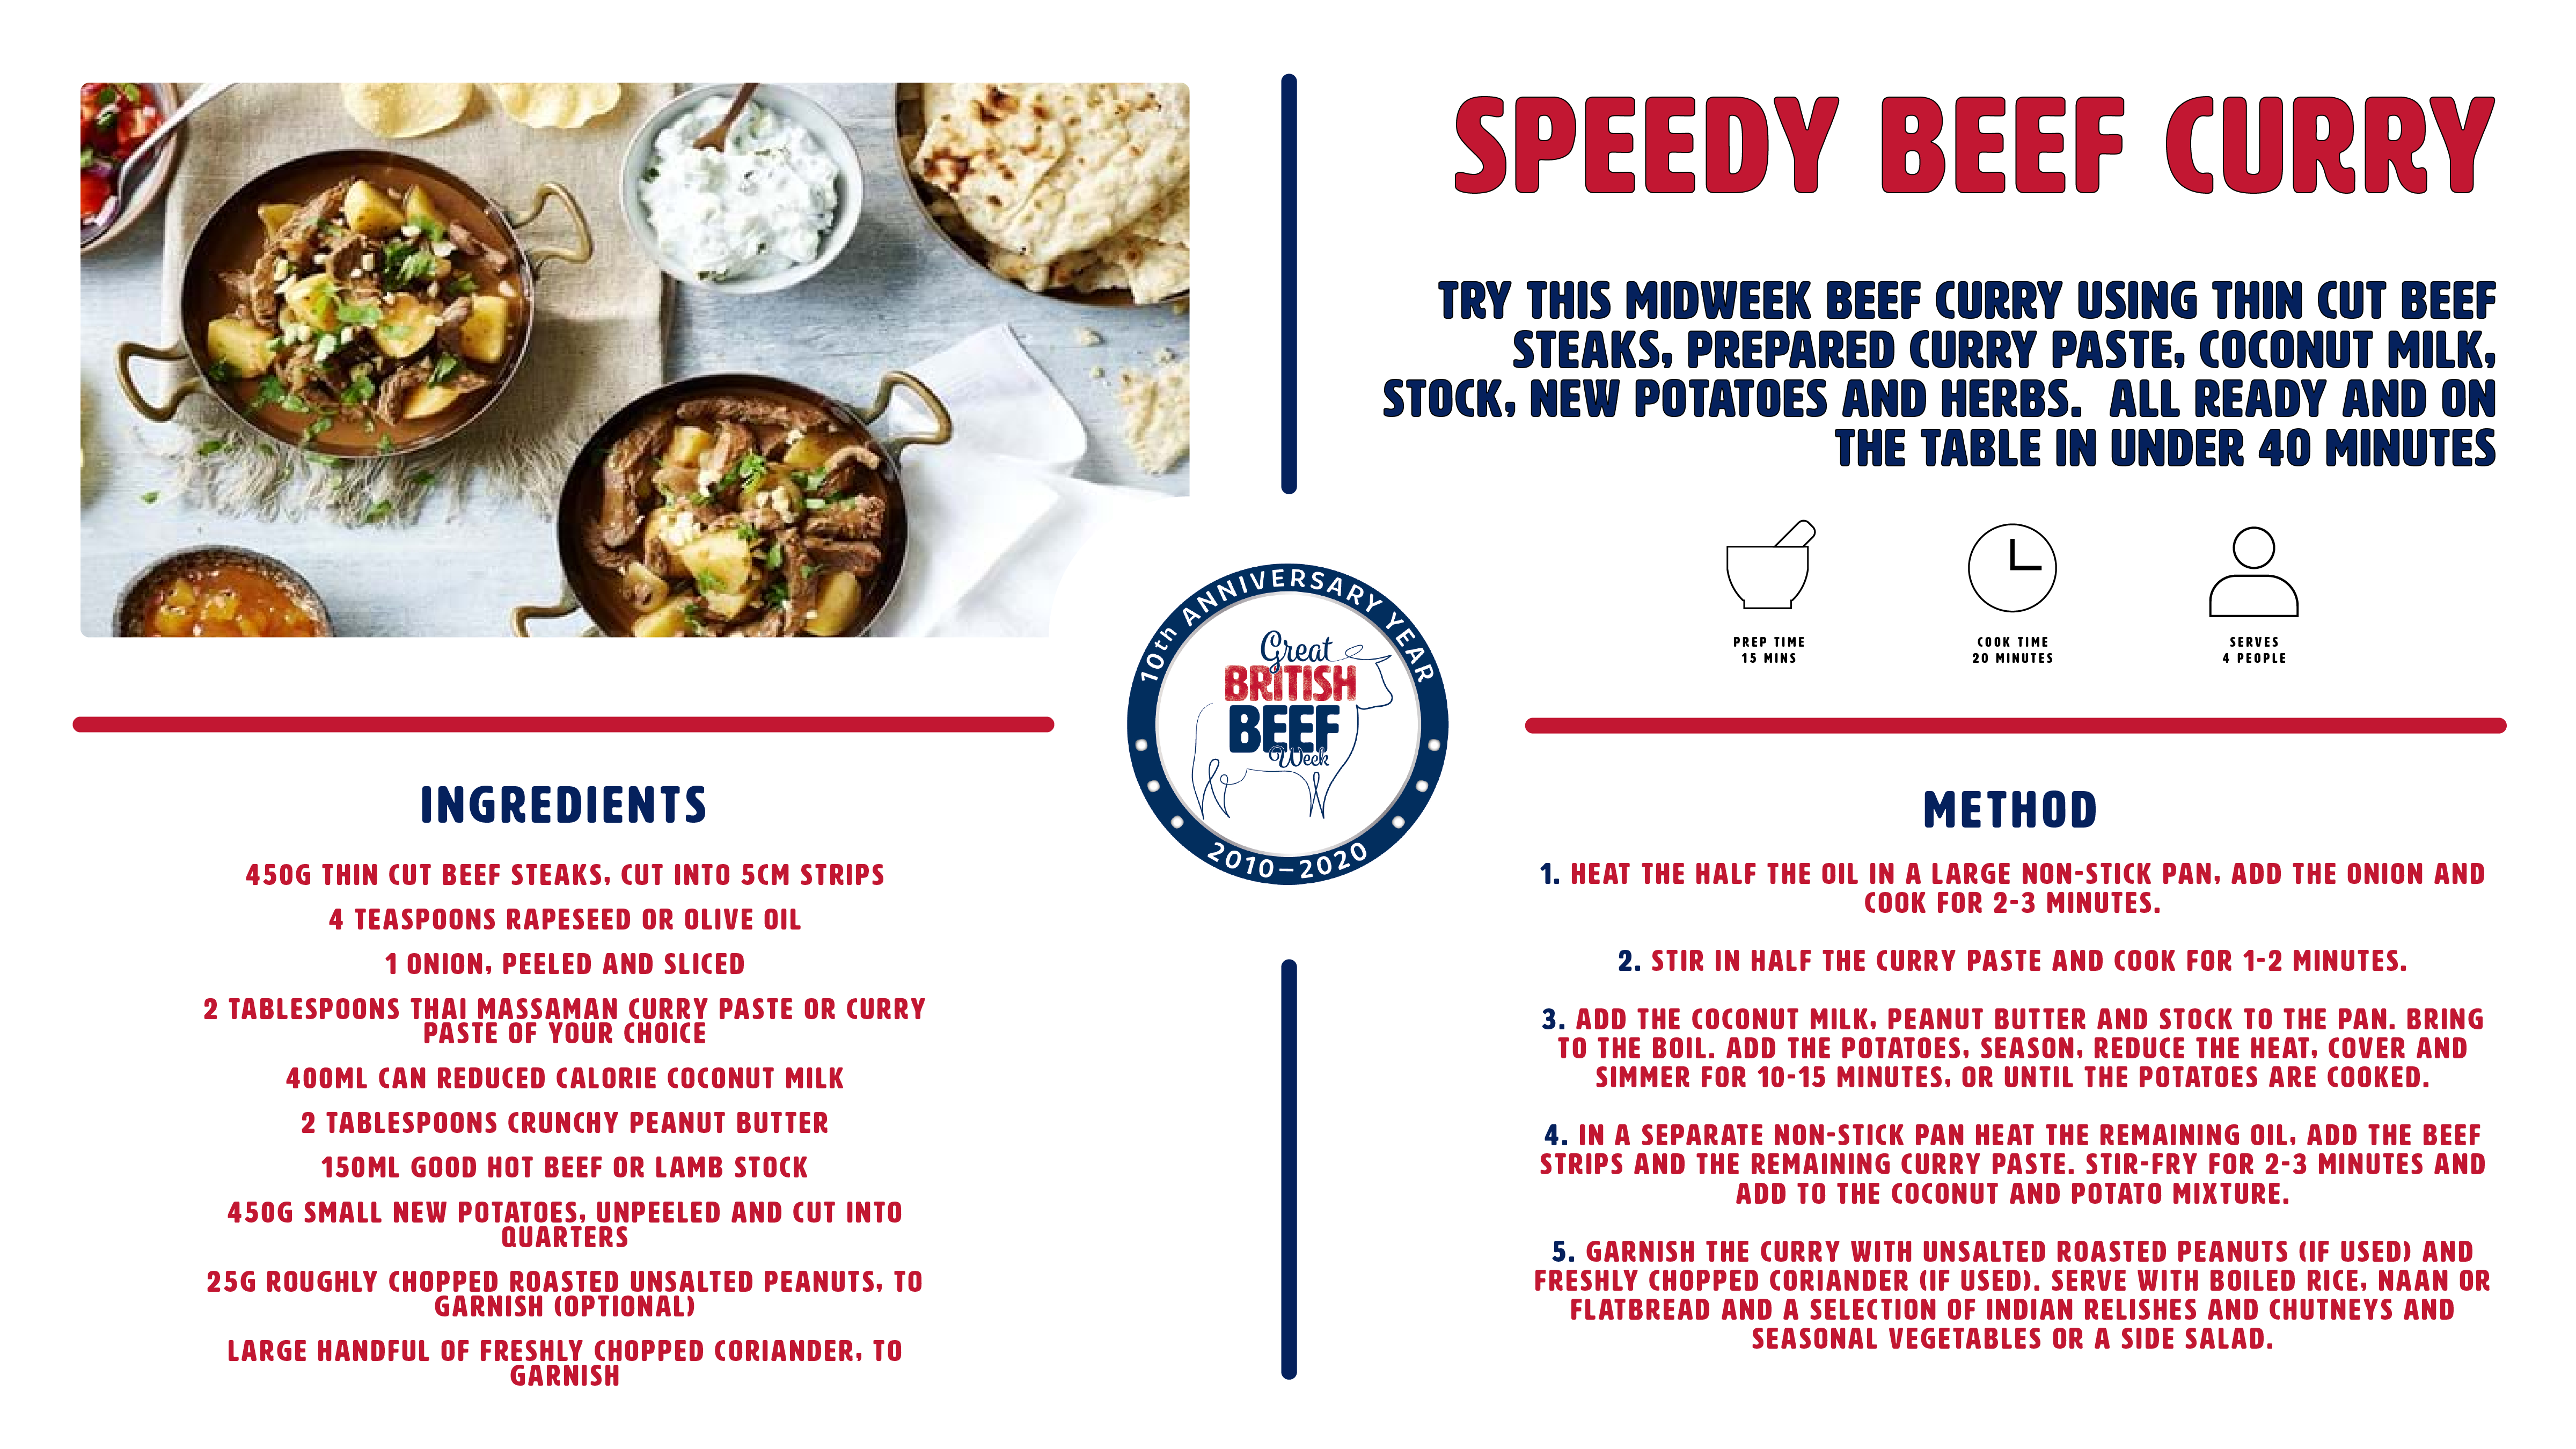 GBBW2020  Speedy Beef Curry recipe card